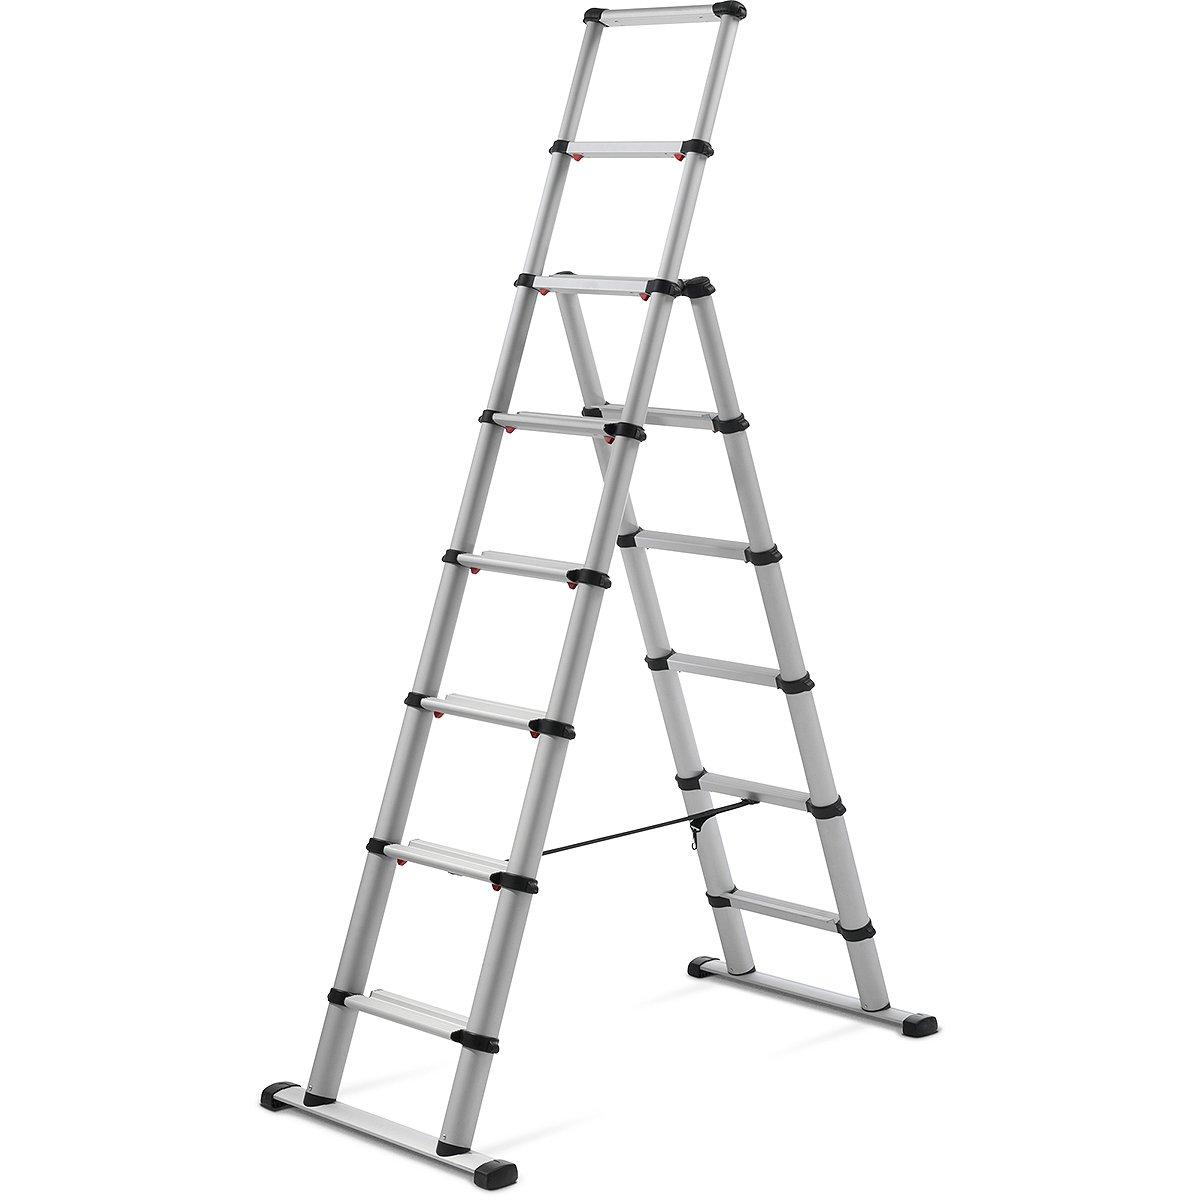 60623-501 Combi Ladder Telesteps TEL60623101 Silver